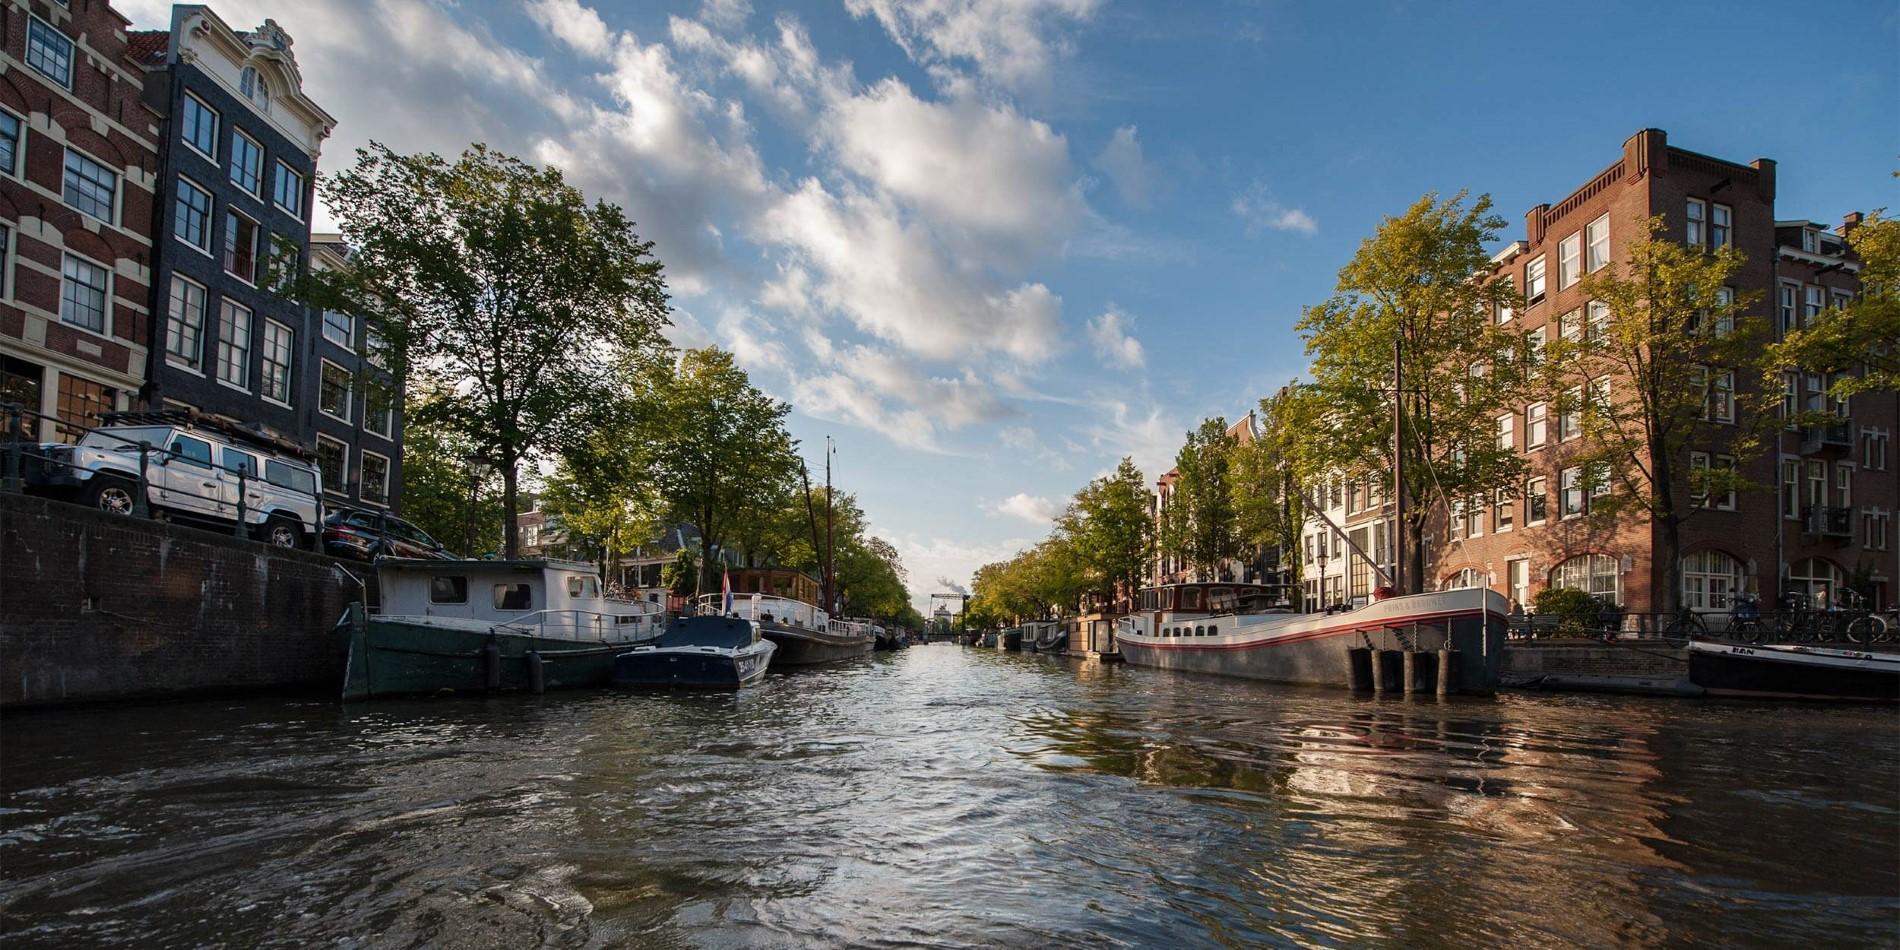 2016-09-18-7231-Amsterdam-Photo-by-Stefan-Dall-4085821.jpg